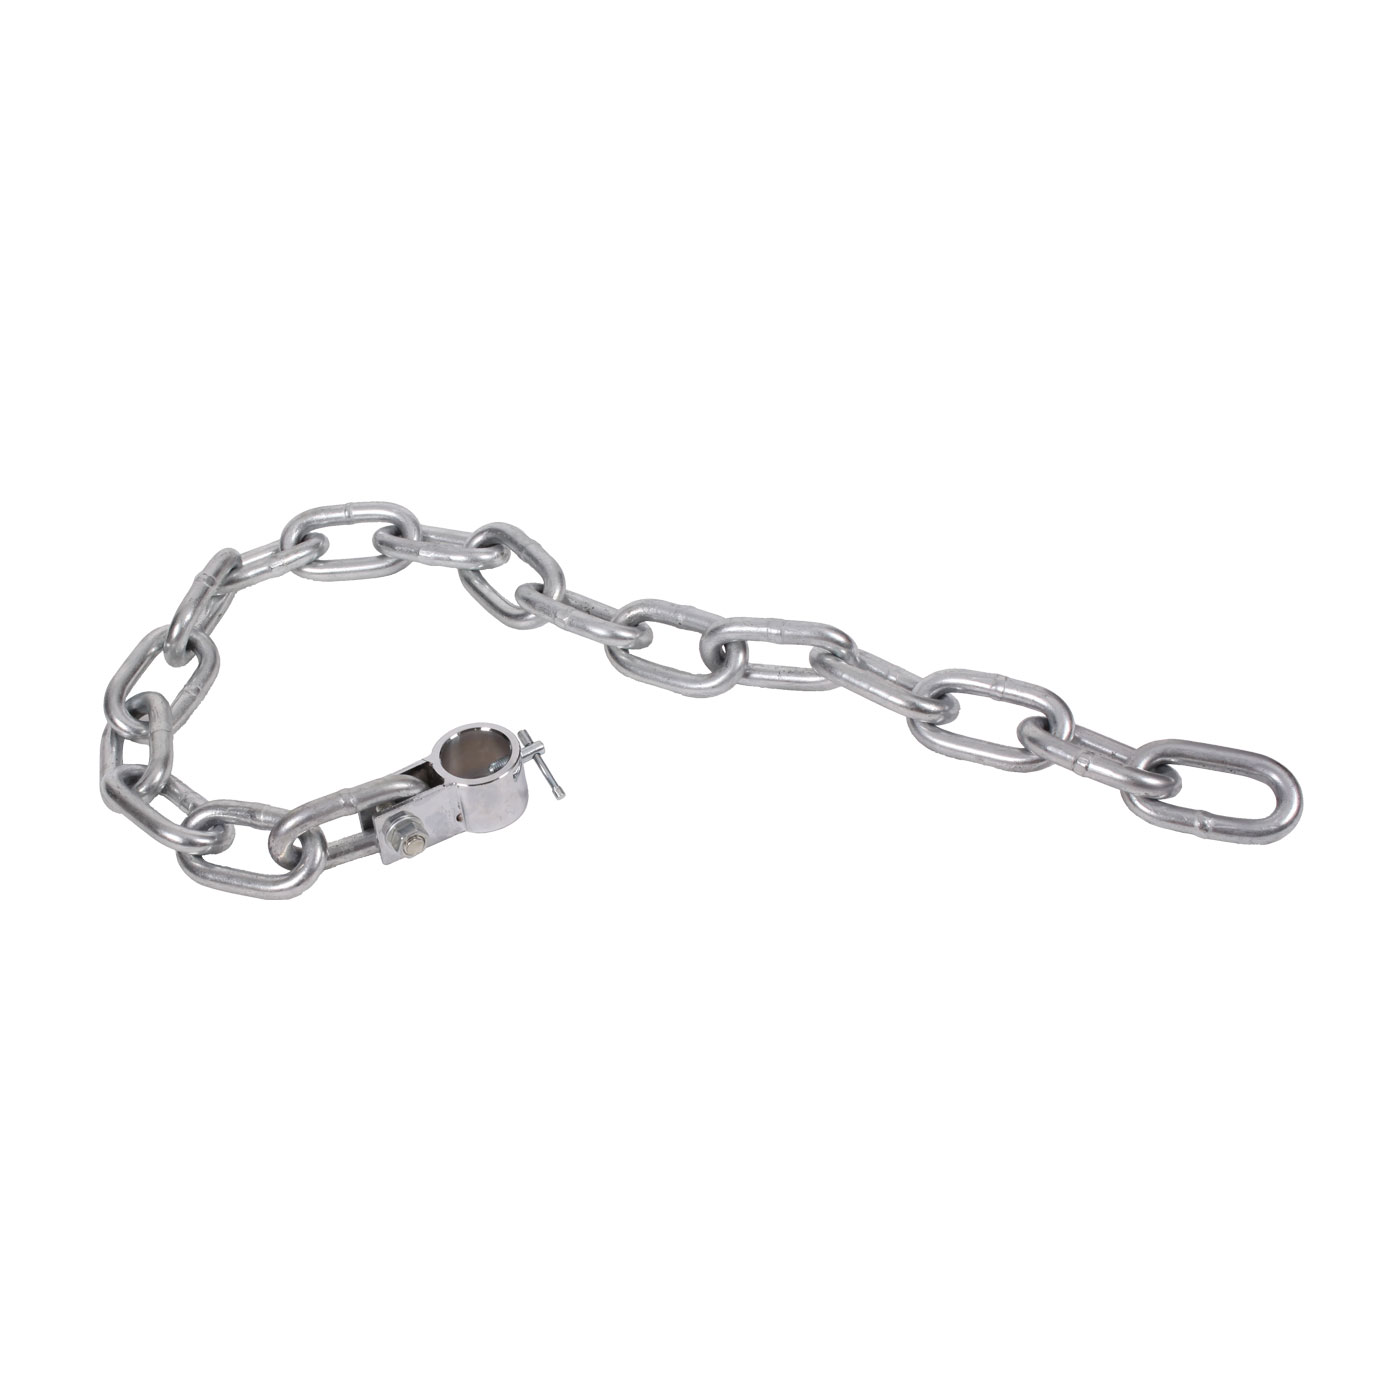 MDBuddy (20KG)重訓鐵鍊 6027301